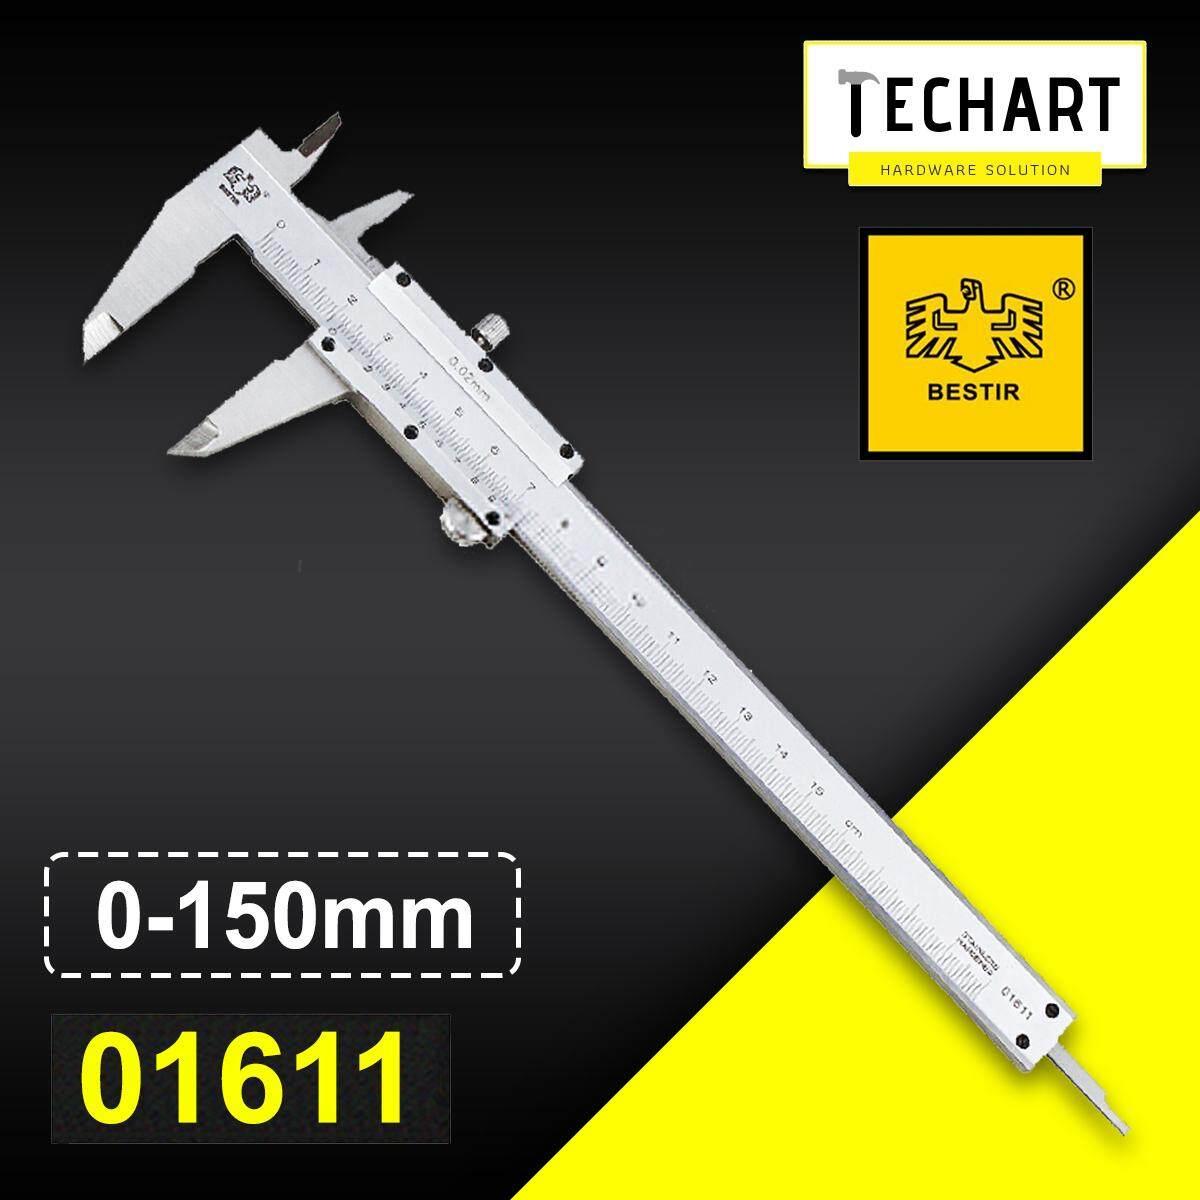 BESTIR 01611 / 01612 / 01613 Stainless Hardened Steel 0~150 / 0~200 / 0~300mm Vernier Caliper Micrometer Measuring Tool